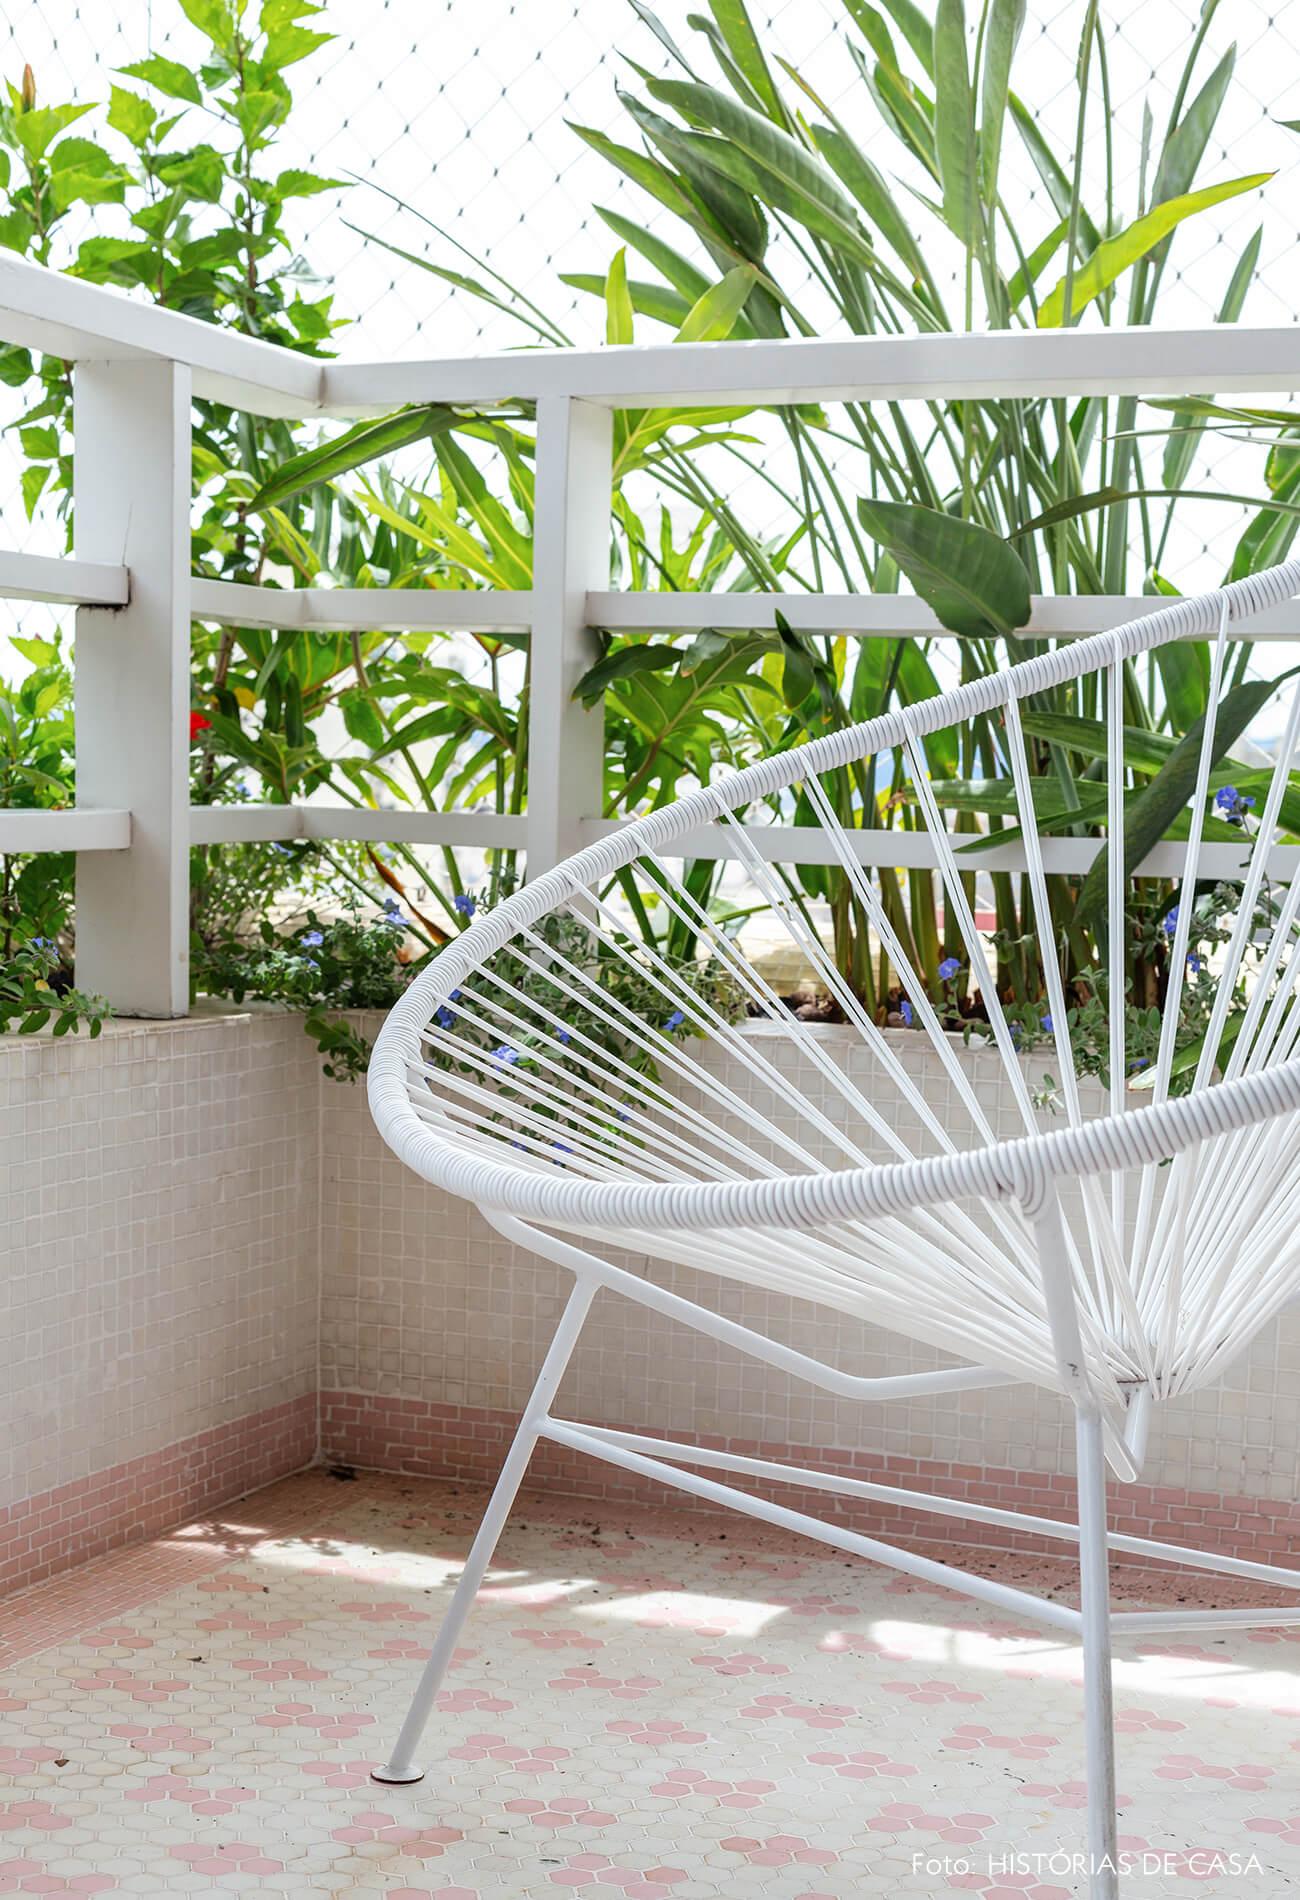 Poltrona Acapulco branca na varanda